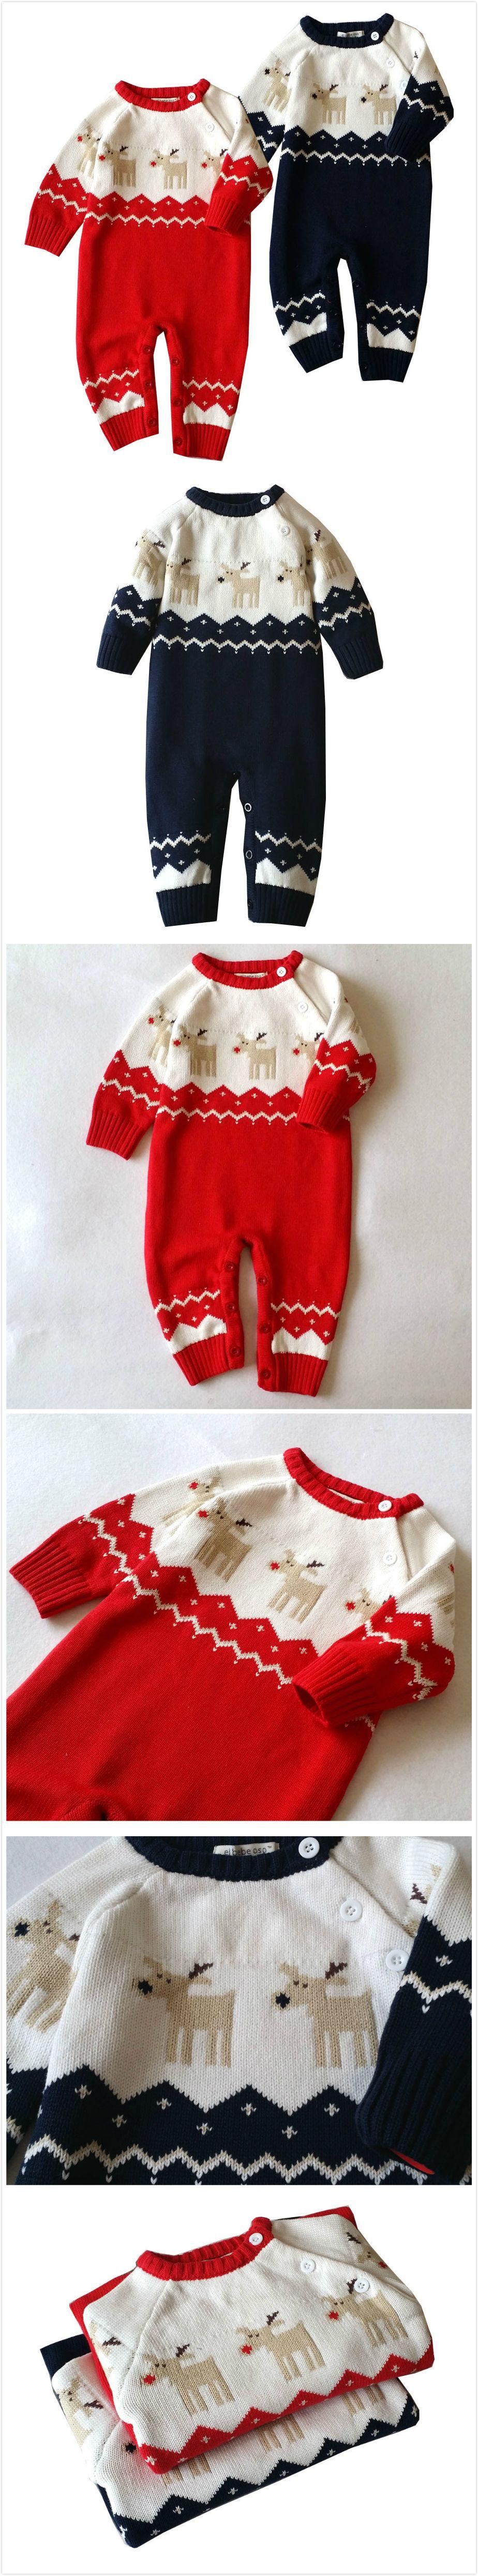 e52fc376b 2-Color Baby Christmas Elk Design Romper For Autumn